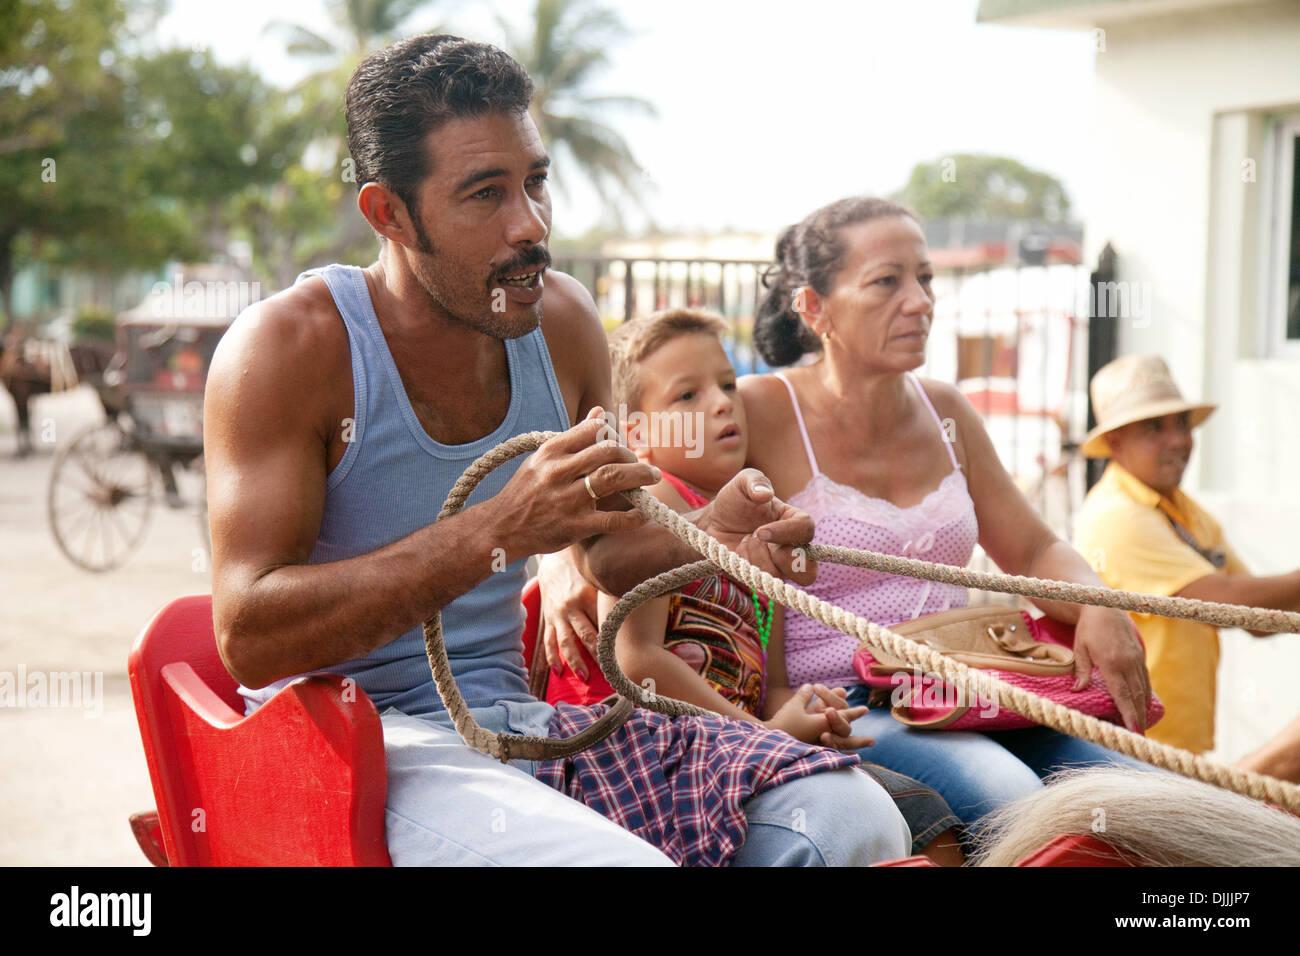 Cuba - la familia cubana de la madre, el padre y el hijo en un caballo y una carroza, La Habana, Cuba, el Caribe, Foto de stock